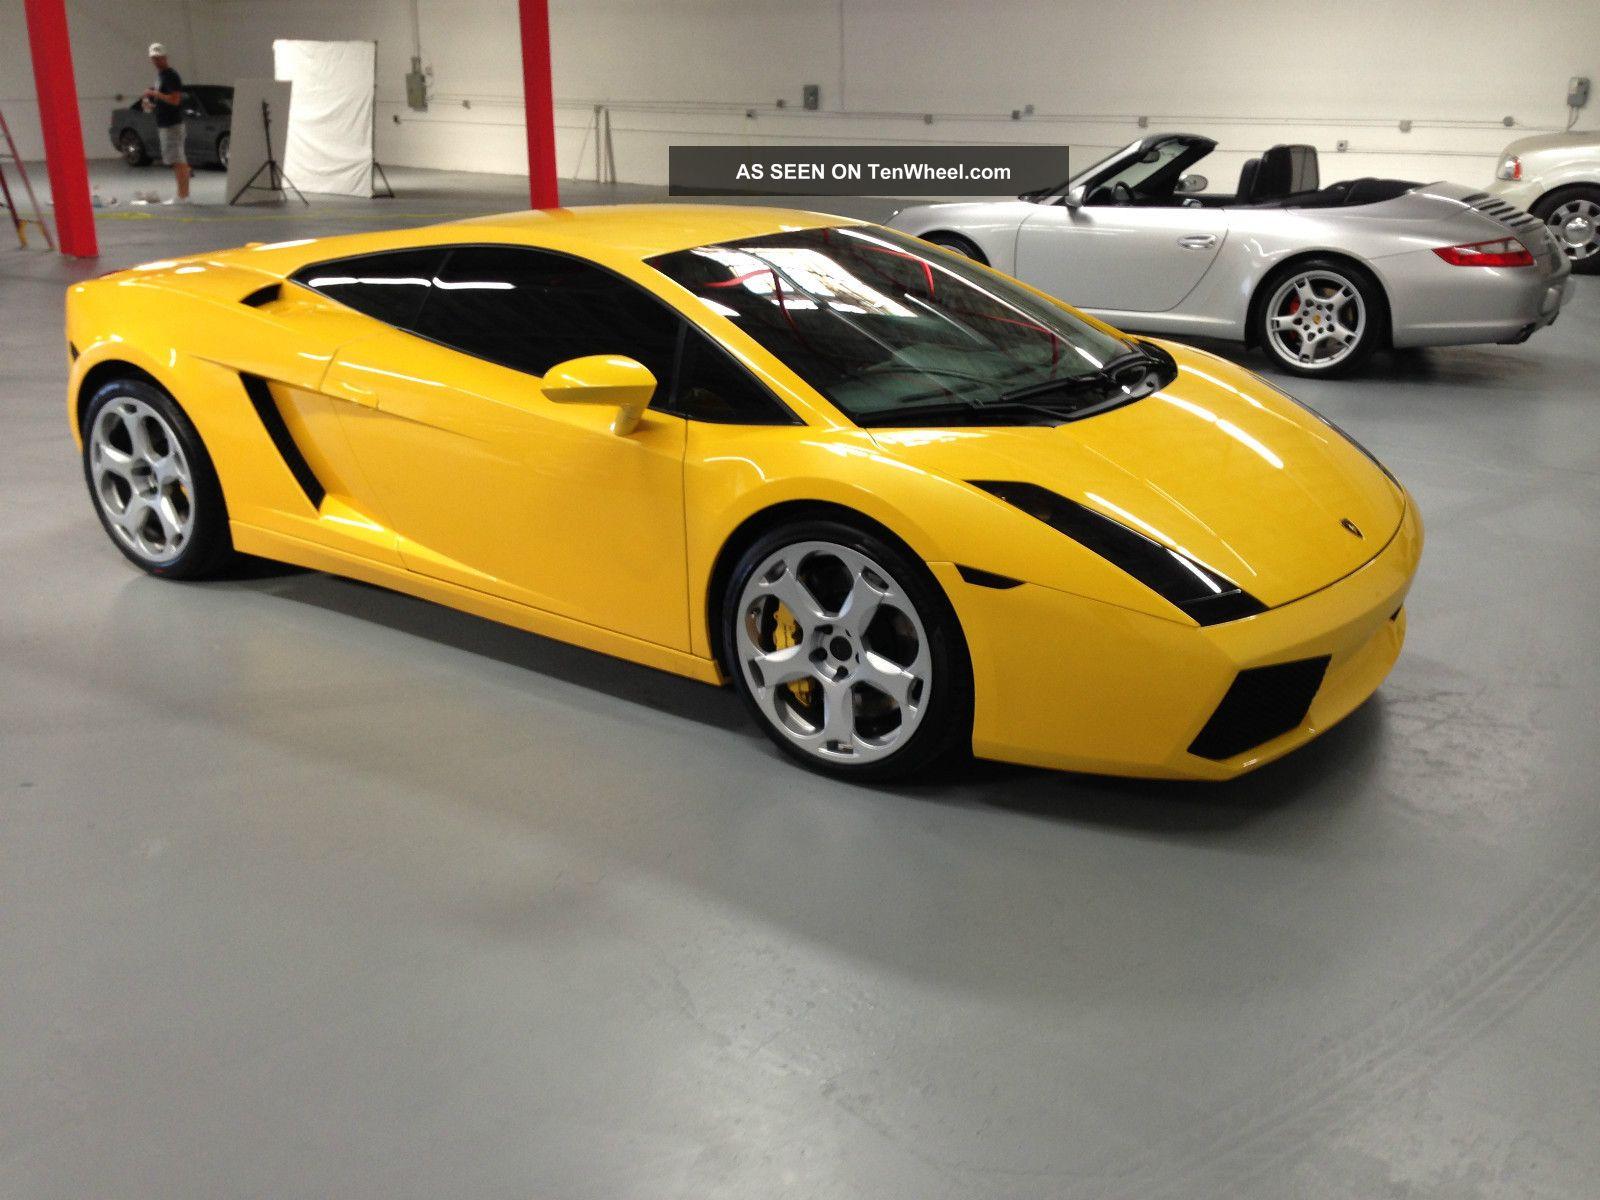 2006 Lamborghini Gallardo  Yellow  Serviced, Exhaust, Loud